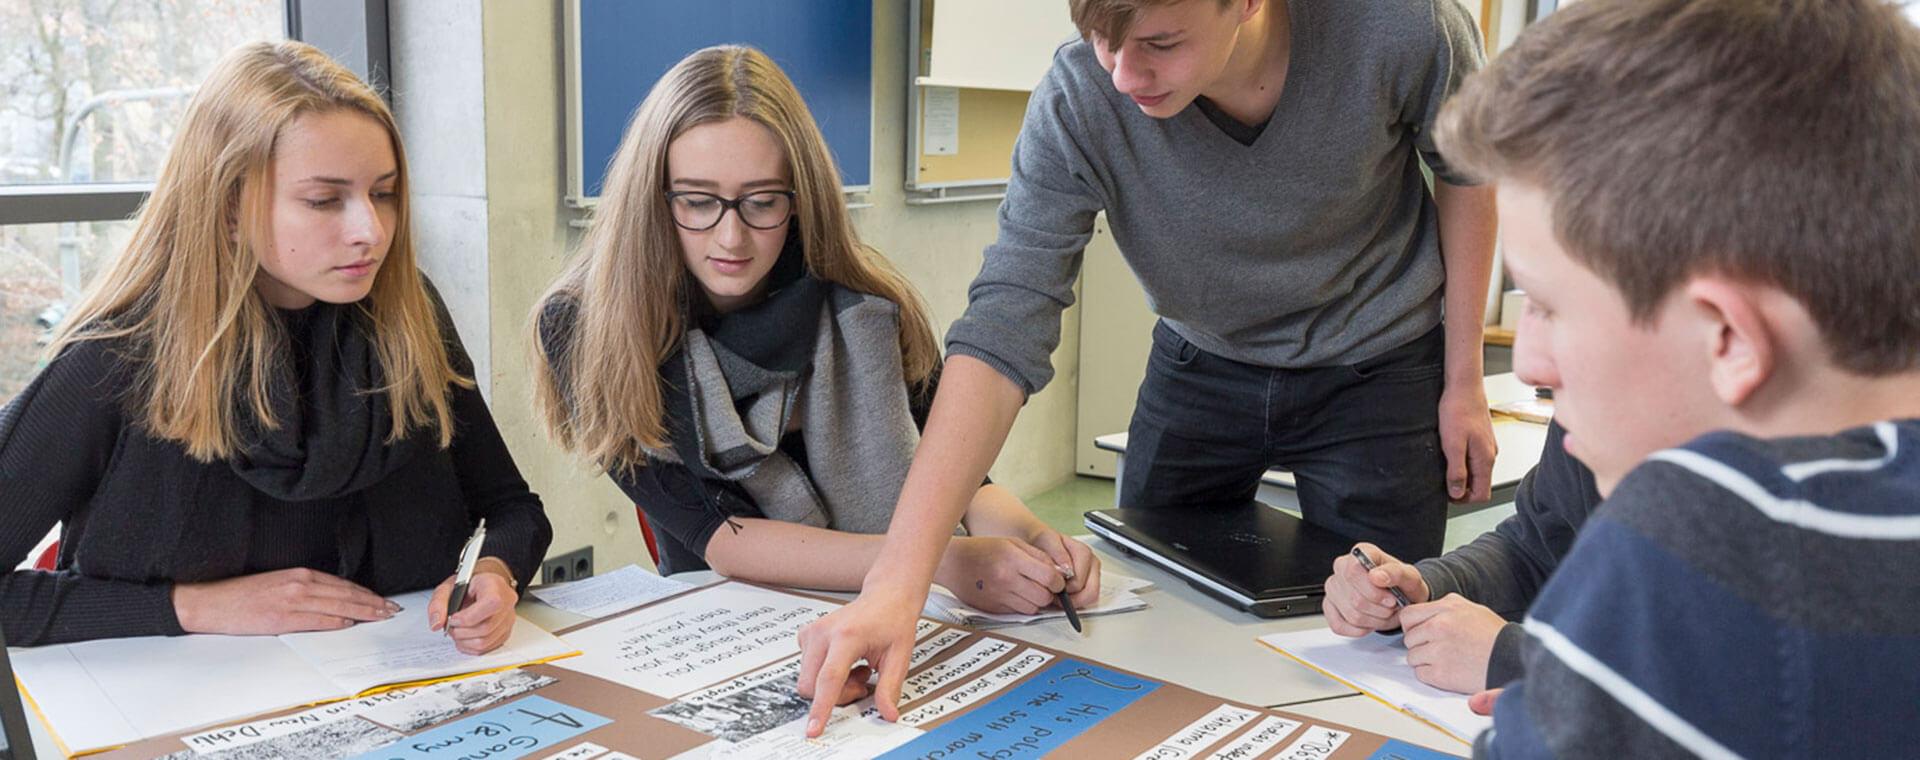 Montessorie Erlangen - Gruppenarbeit